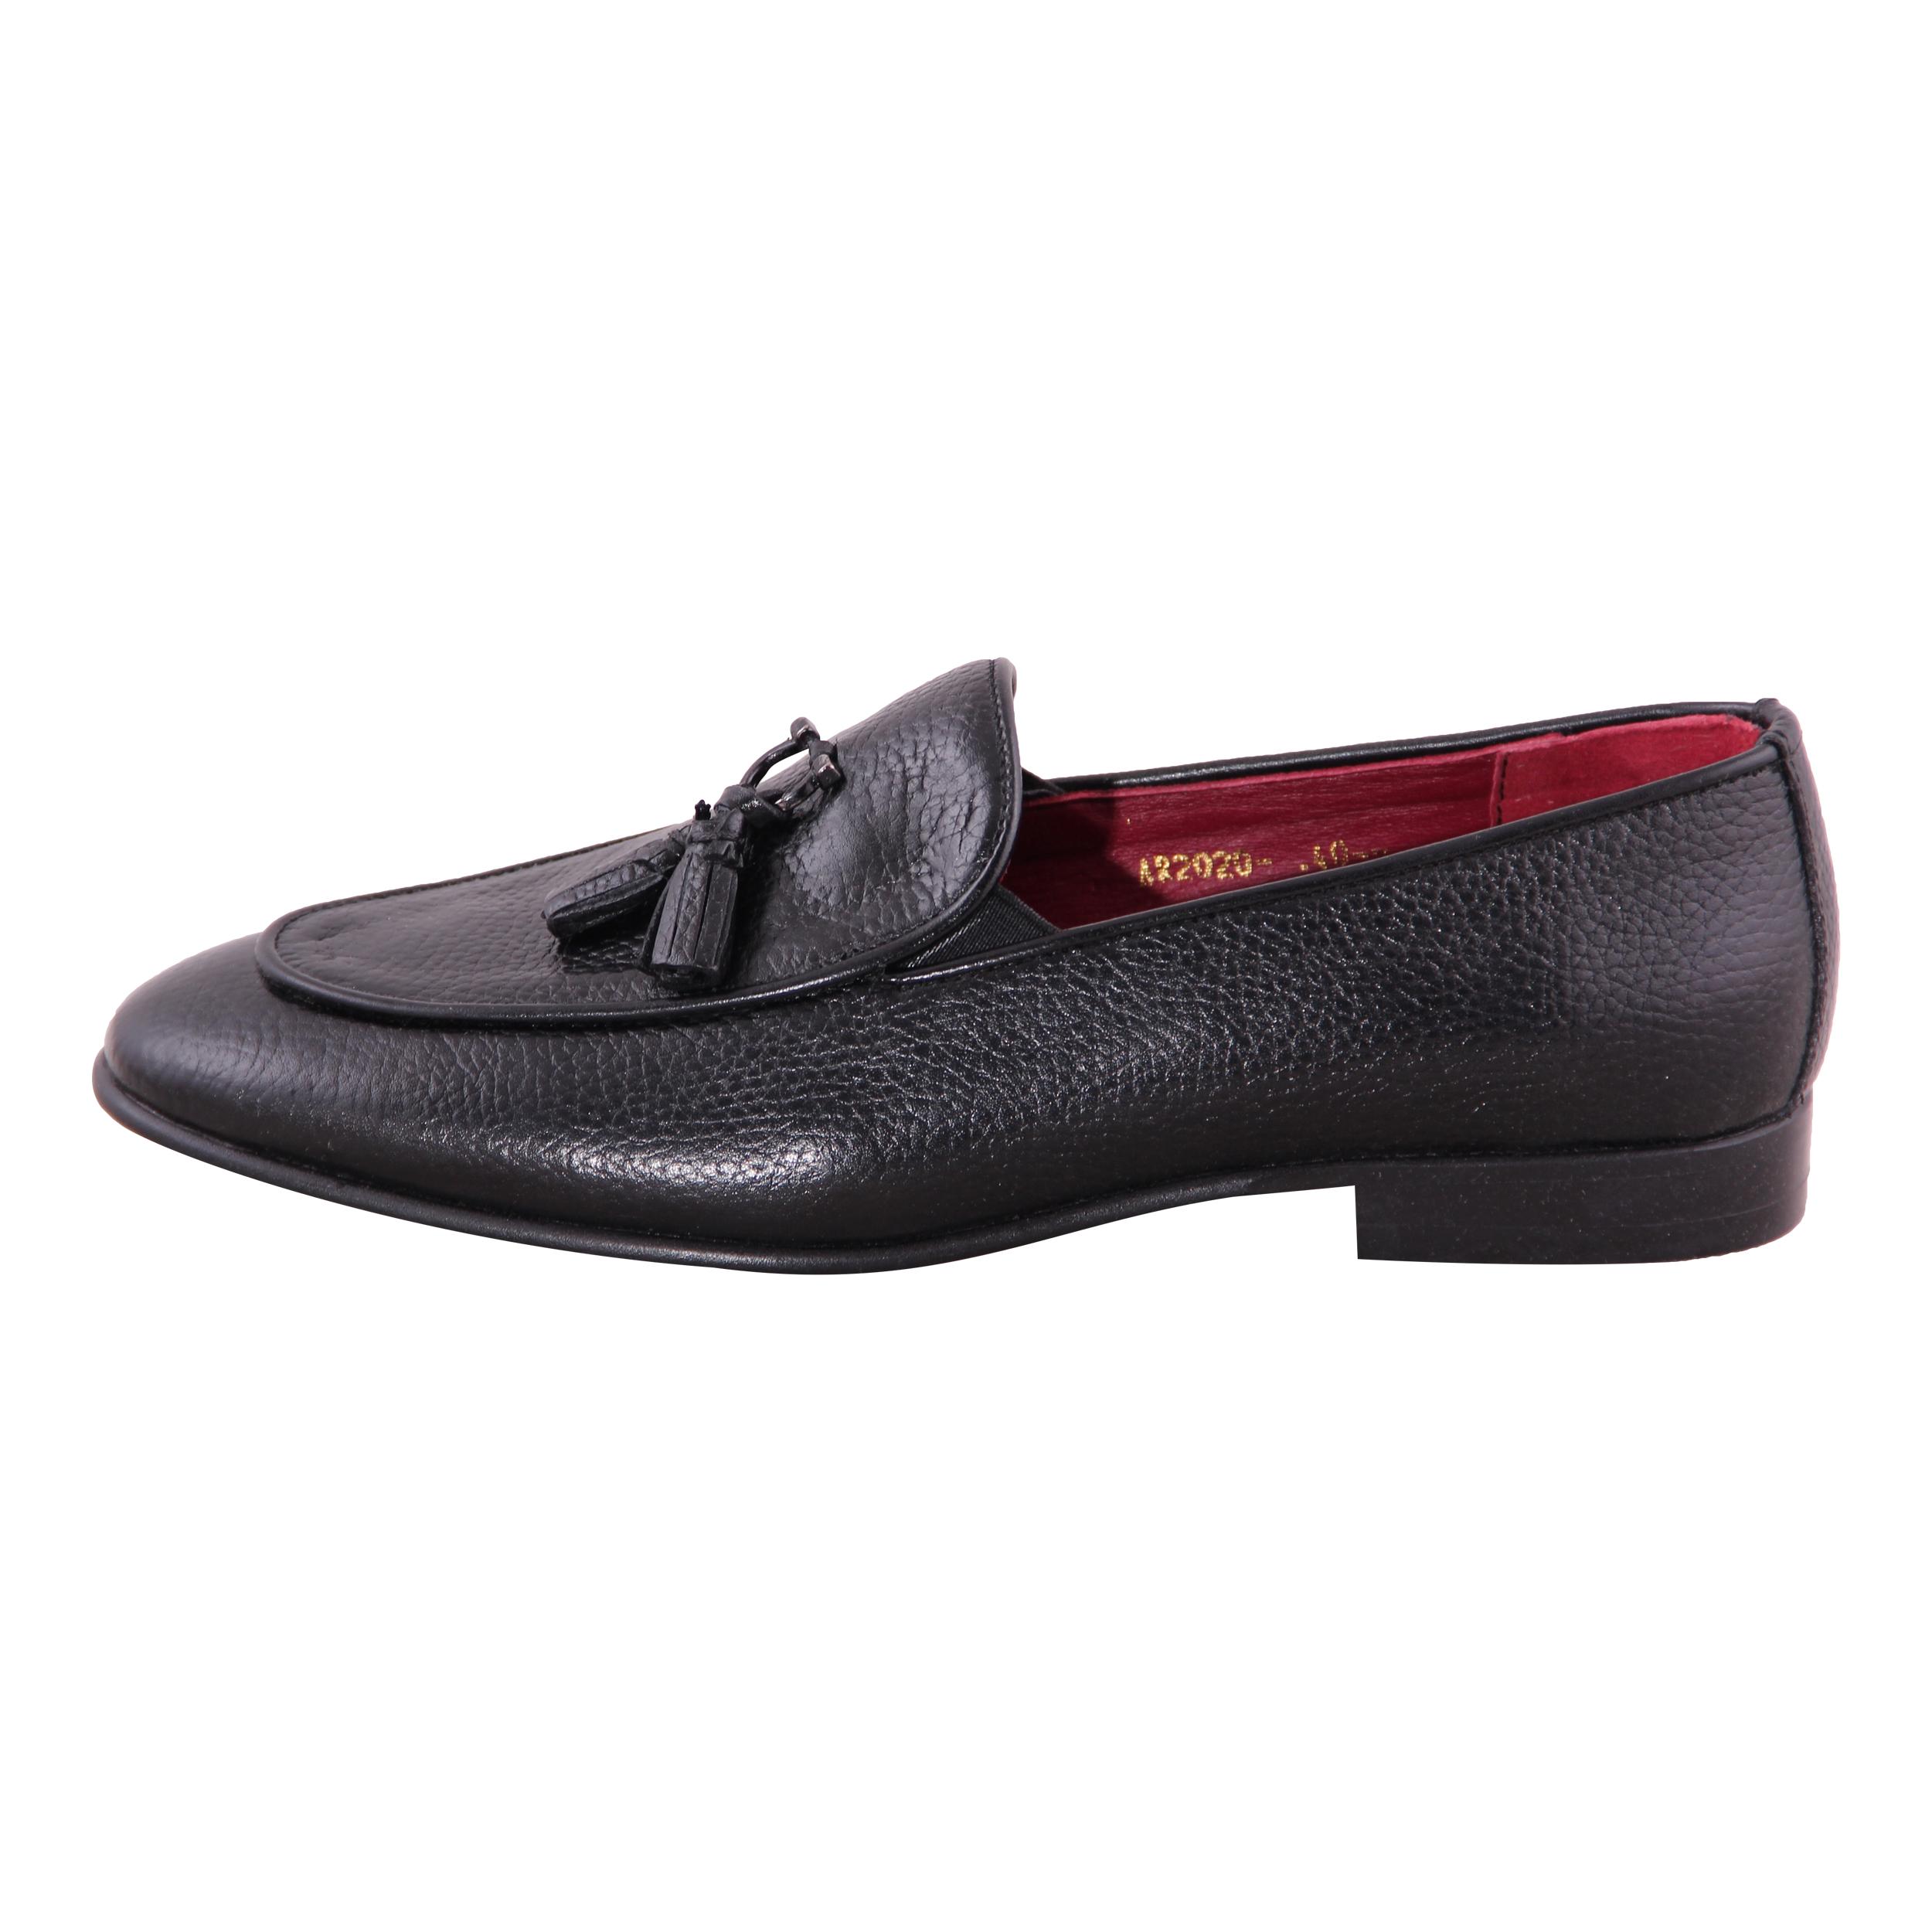 کفش مردانه شهر چرم مدل S17002-1